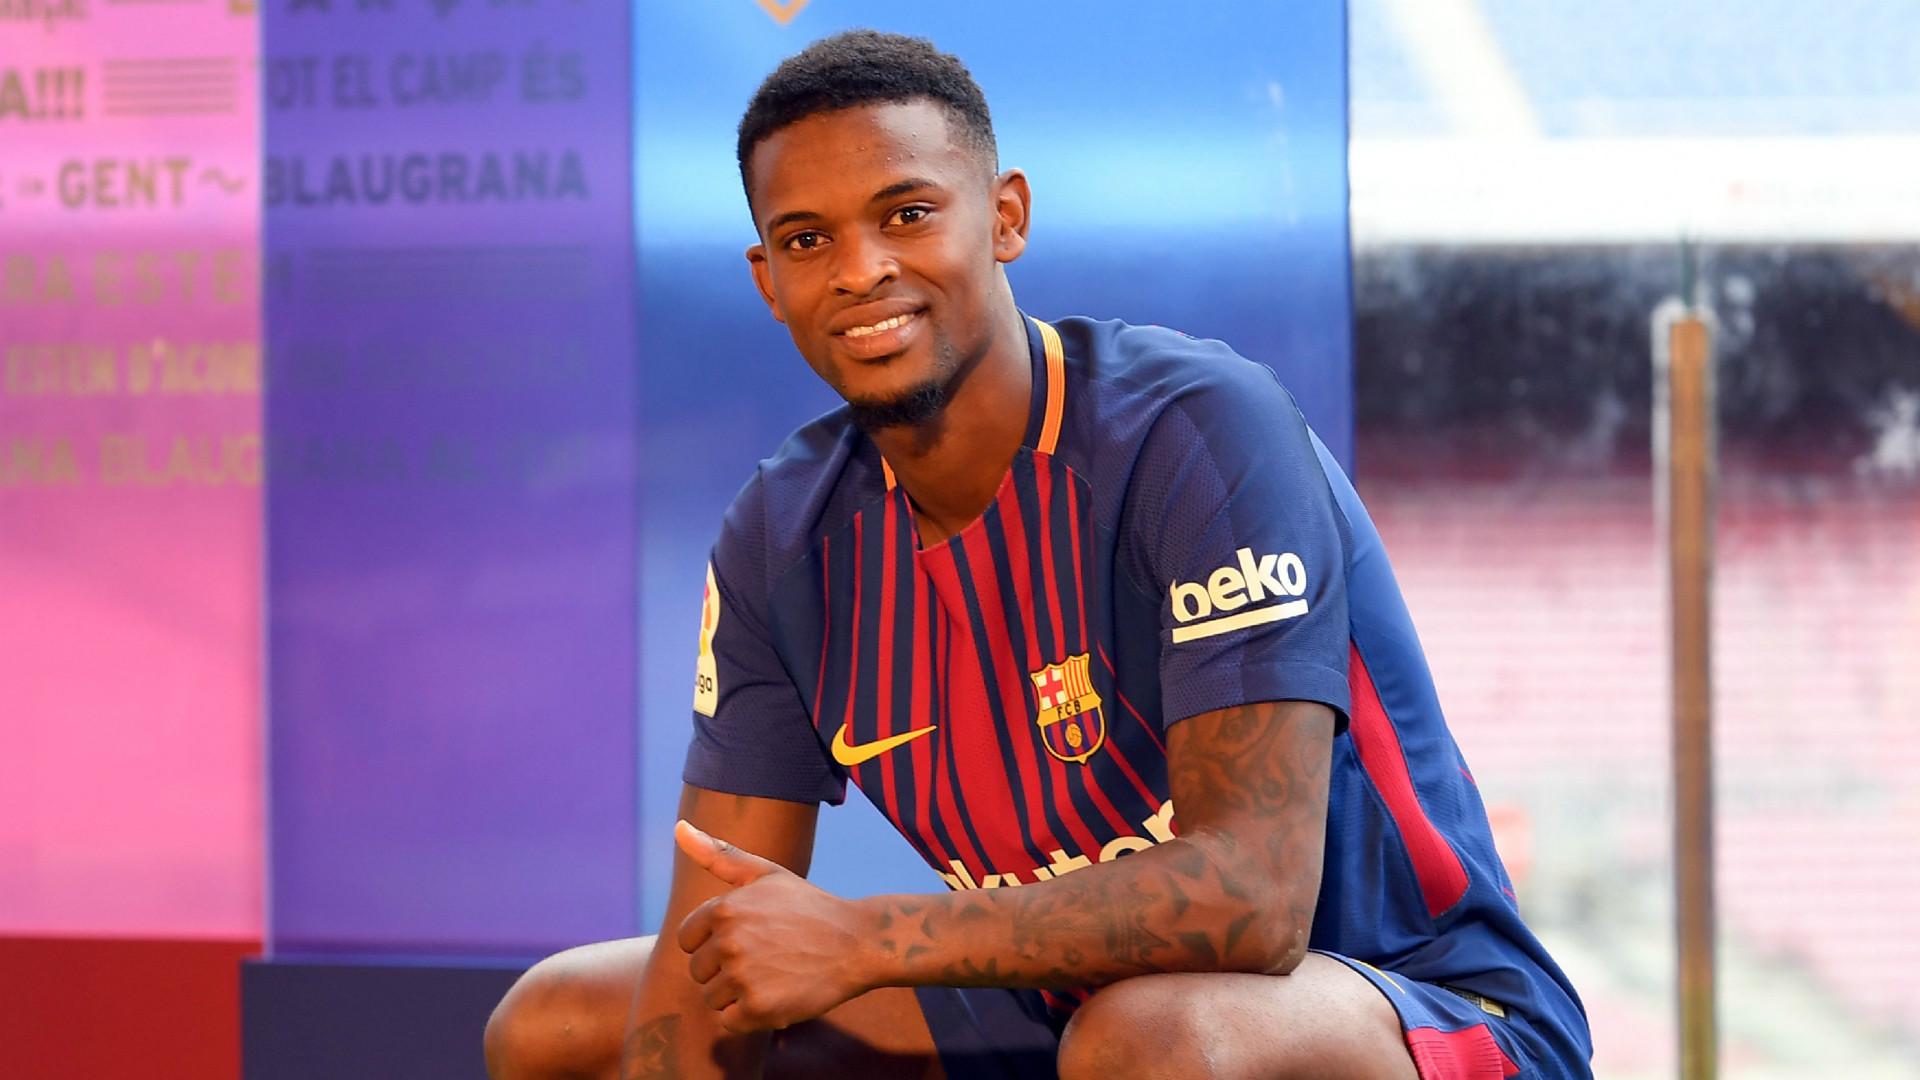 Barca and semedo contract talks broken down - Bóng Đá